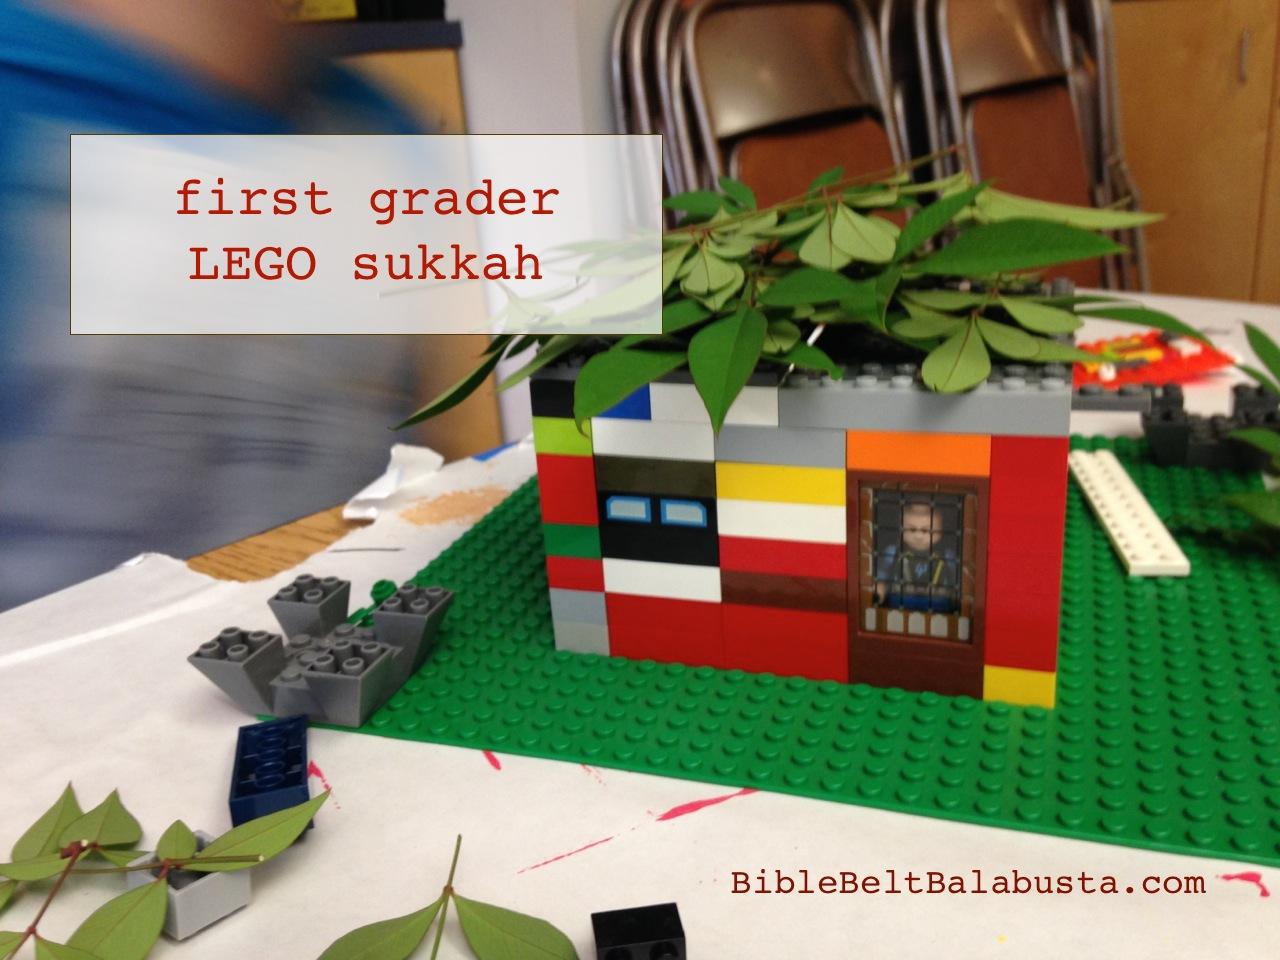 Group Build Lego Model Sukkah Setup Bible Belt Balabusta